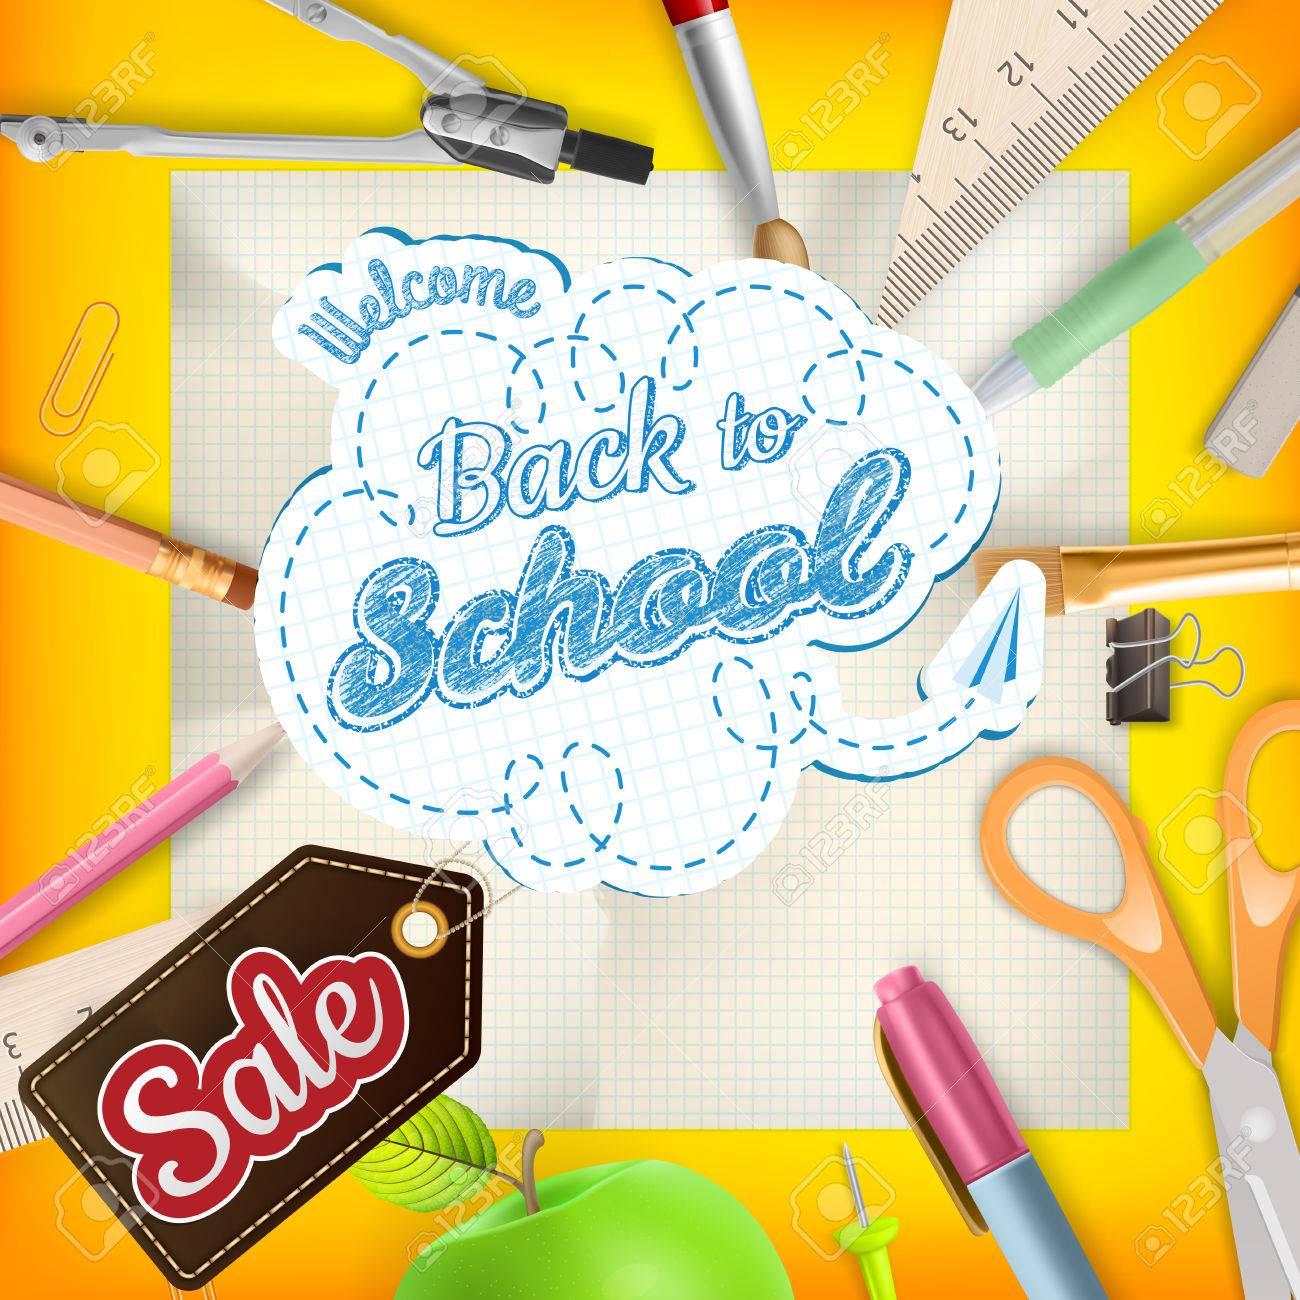 Back to School design sale background. Illustration for greeting card, promotion, poster, flier, blog, article, social media, marketing. vector file included - 44326968